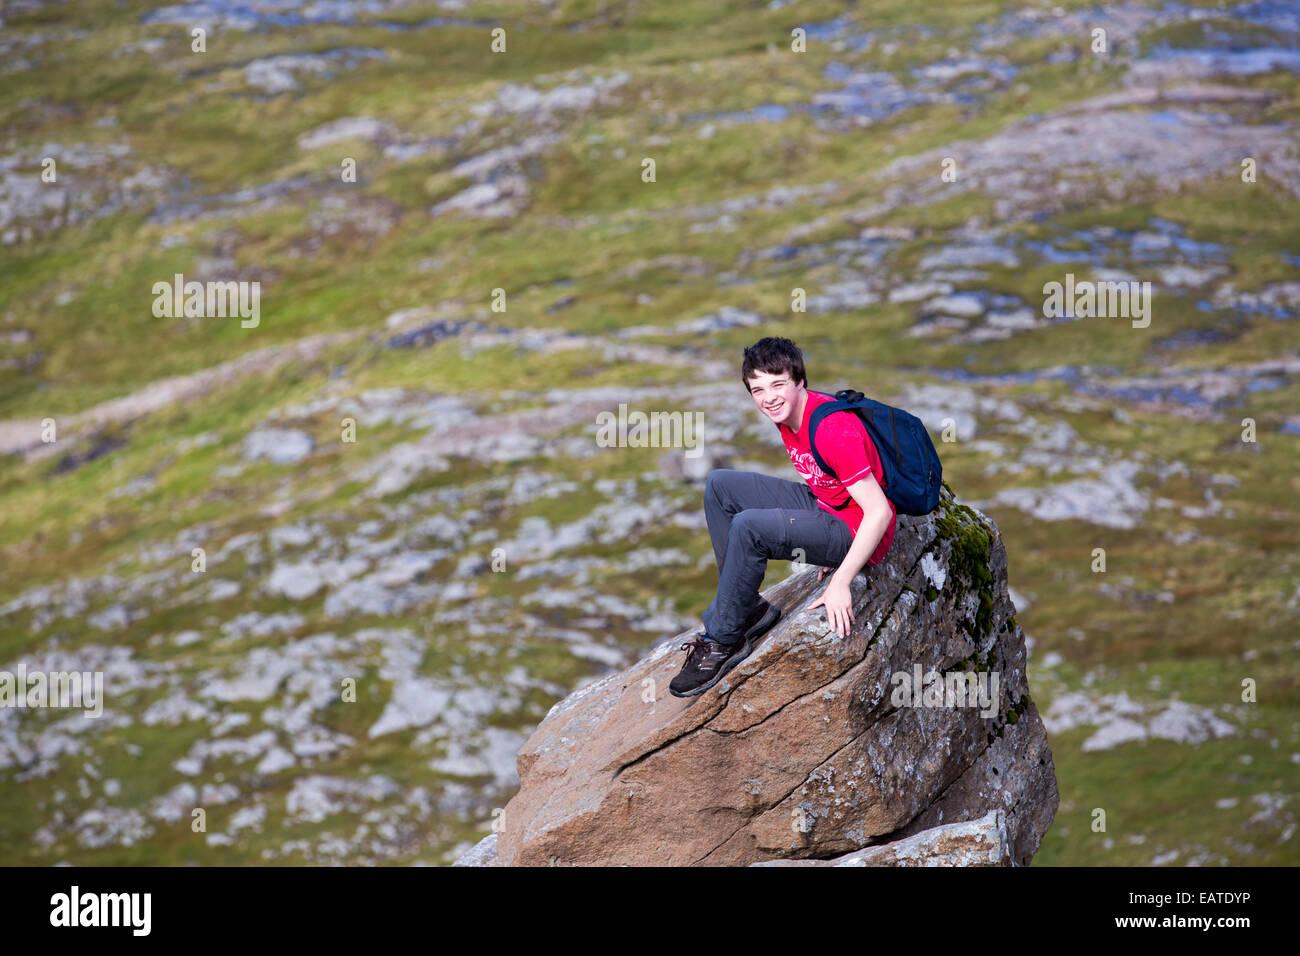 A teenager climbing the Munro on Ben More, Isle of Mull, Scotland, UK. - Stock Image